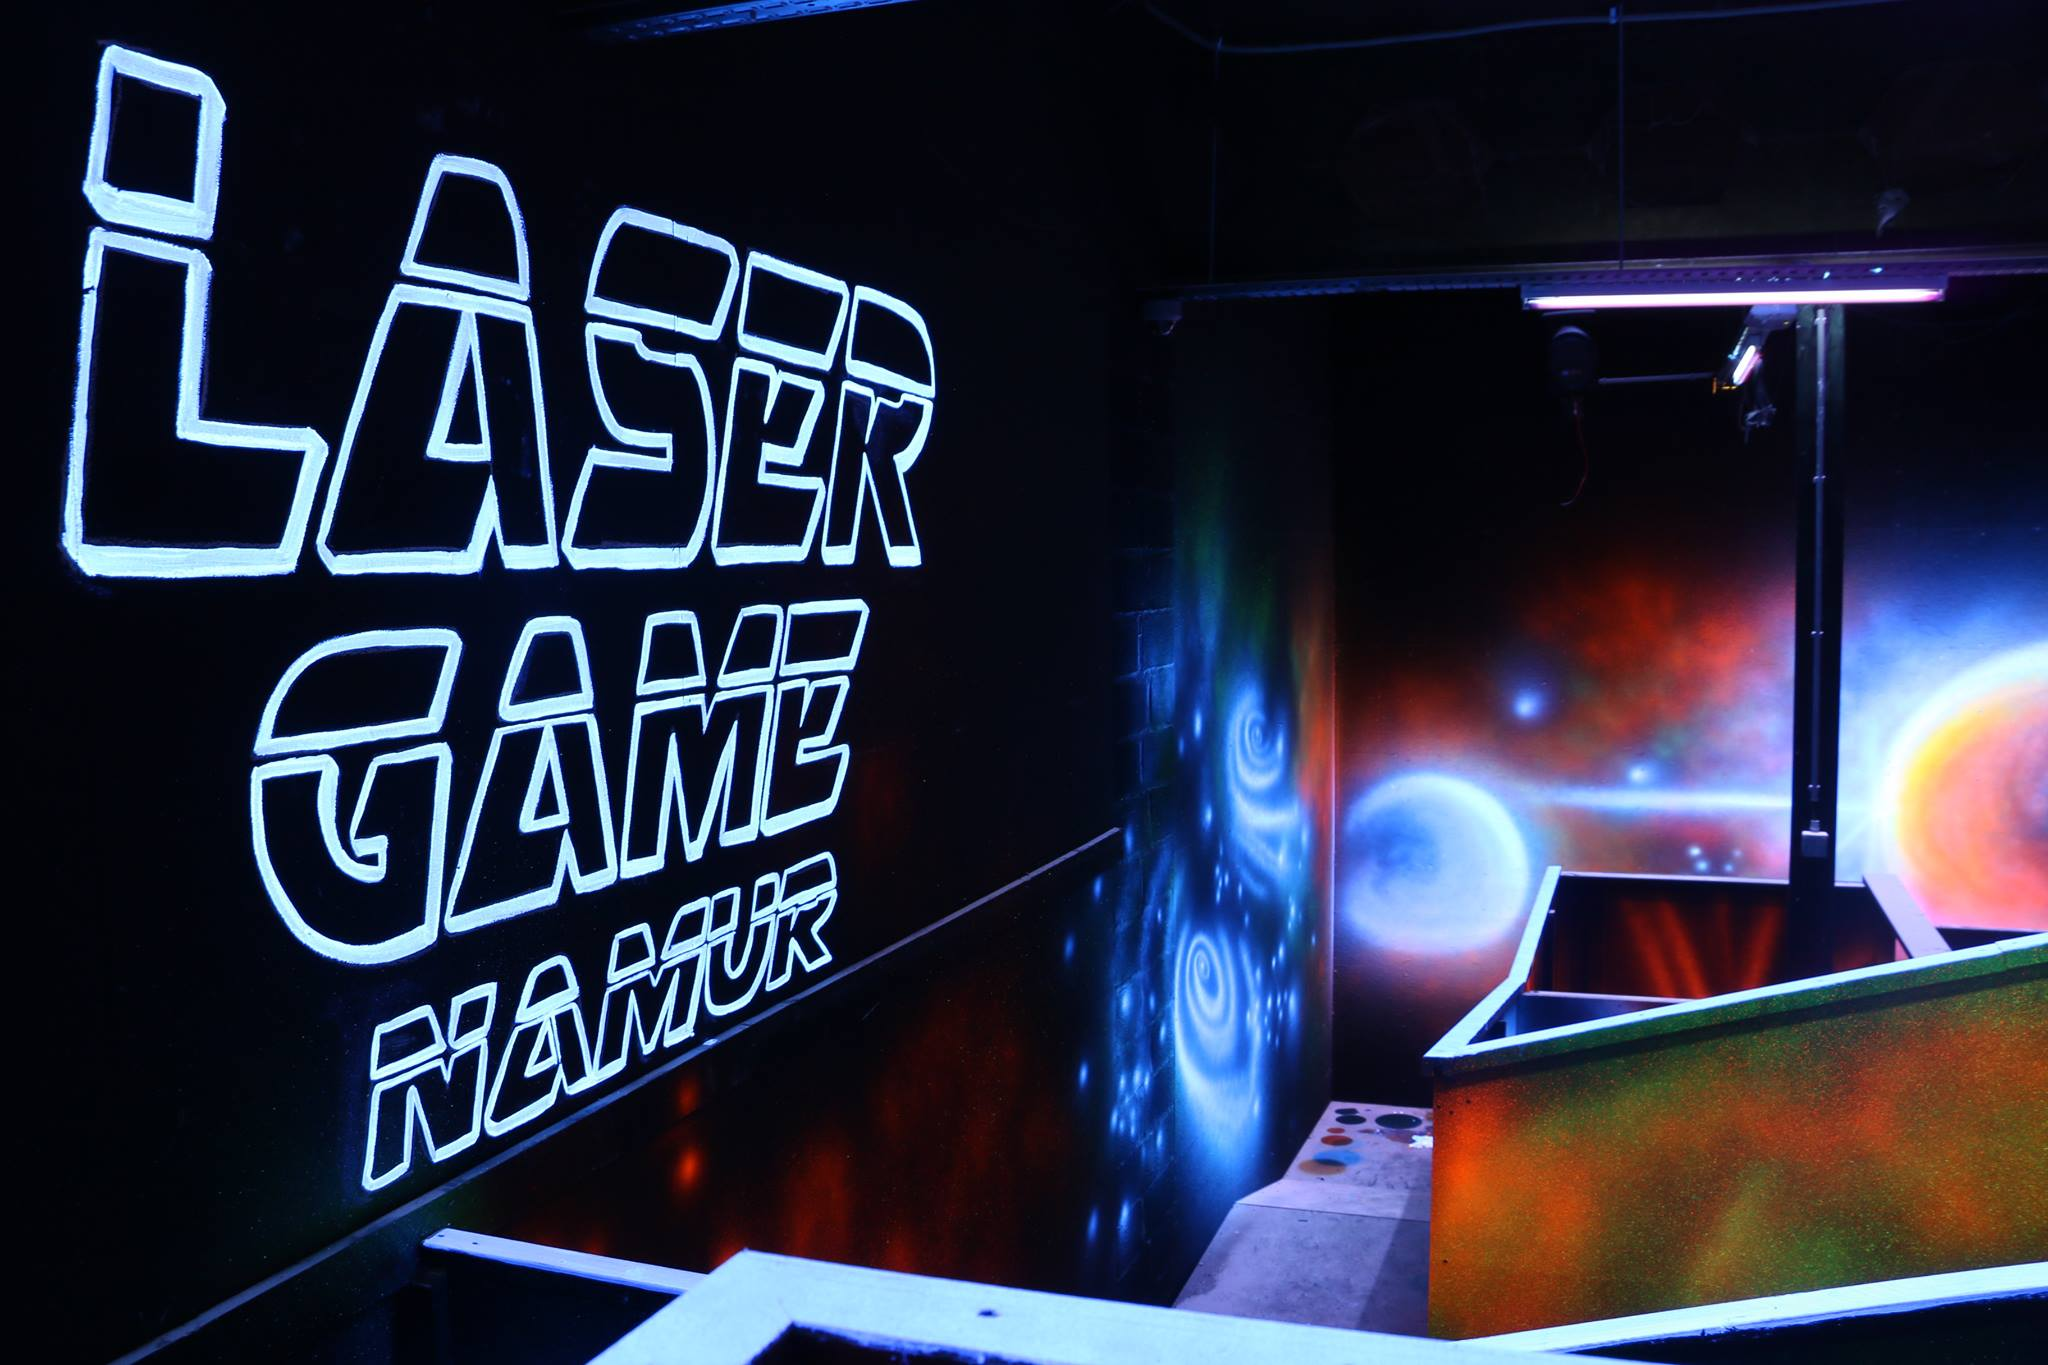 Laser game (c) laser game St-Servais